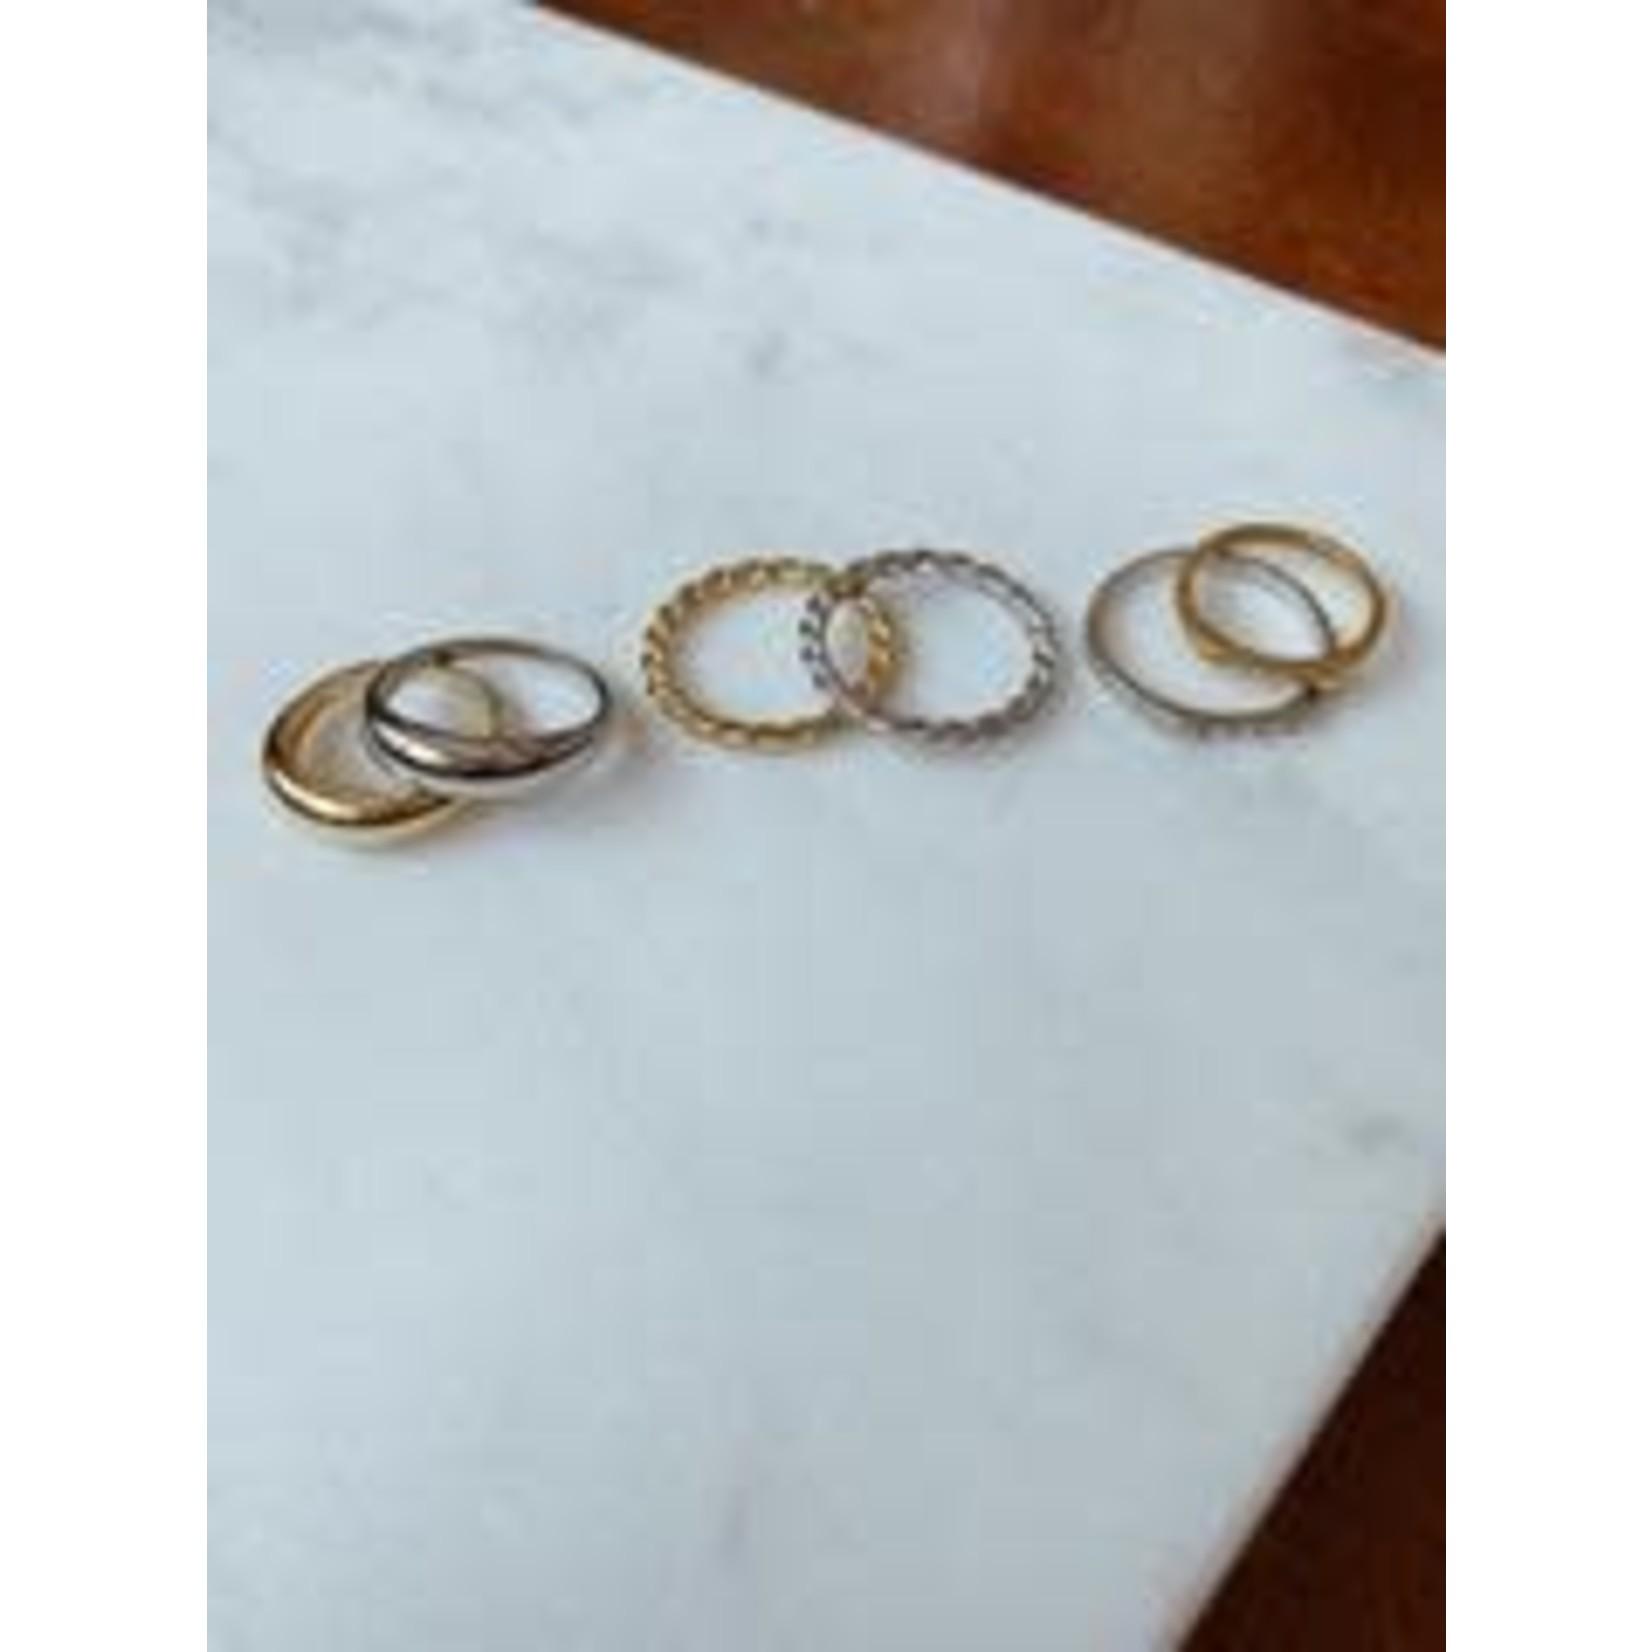 Horace Jewelry Horace - Bague / DUOMO argent